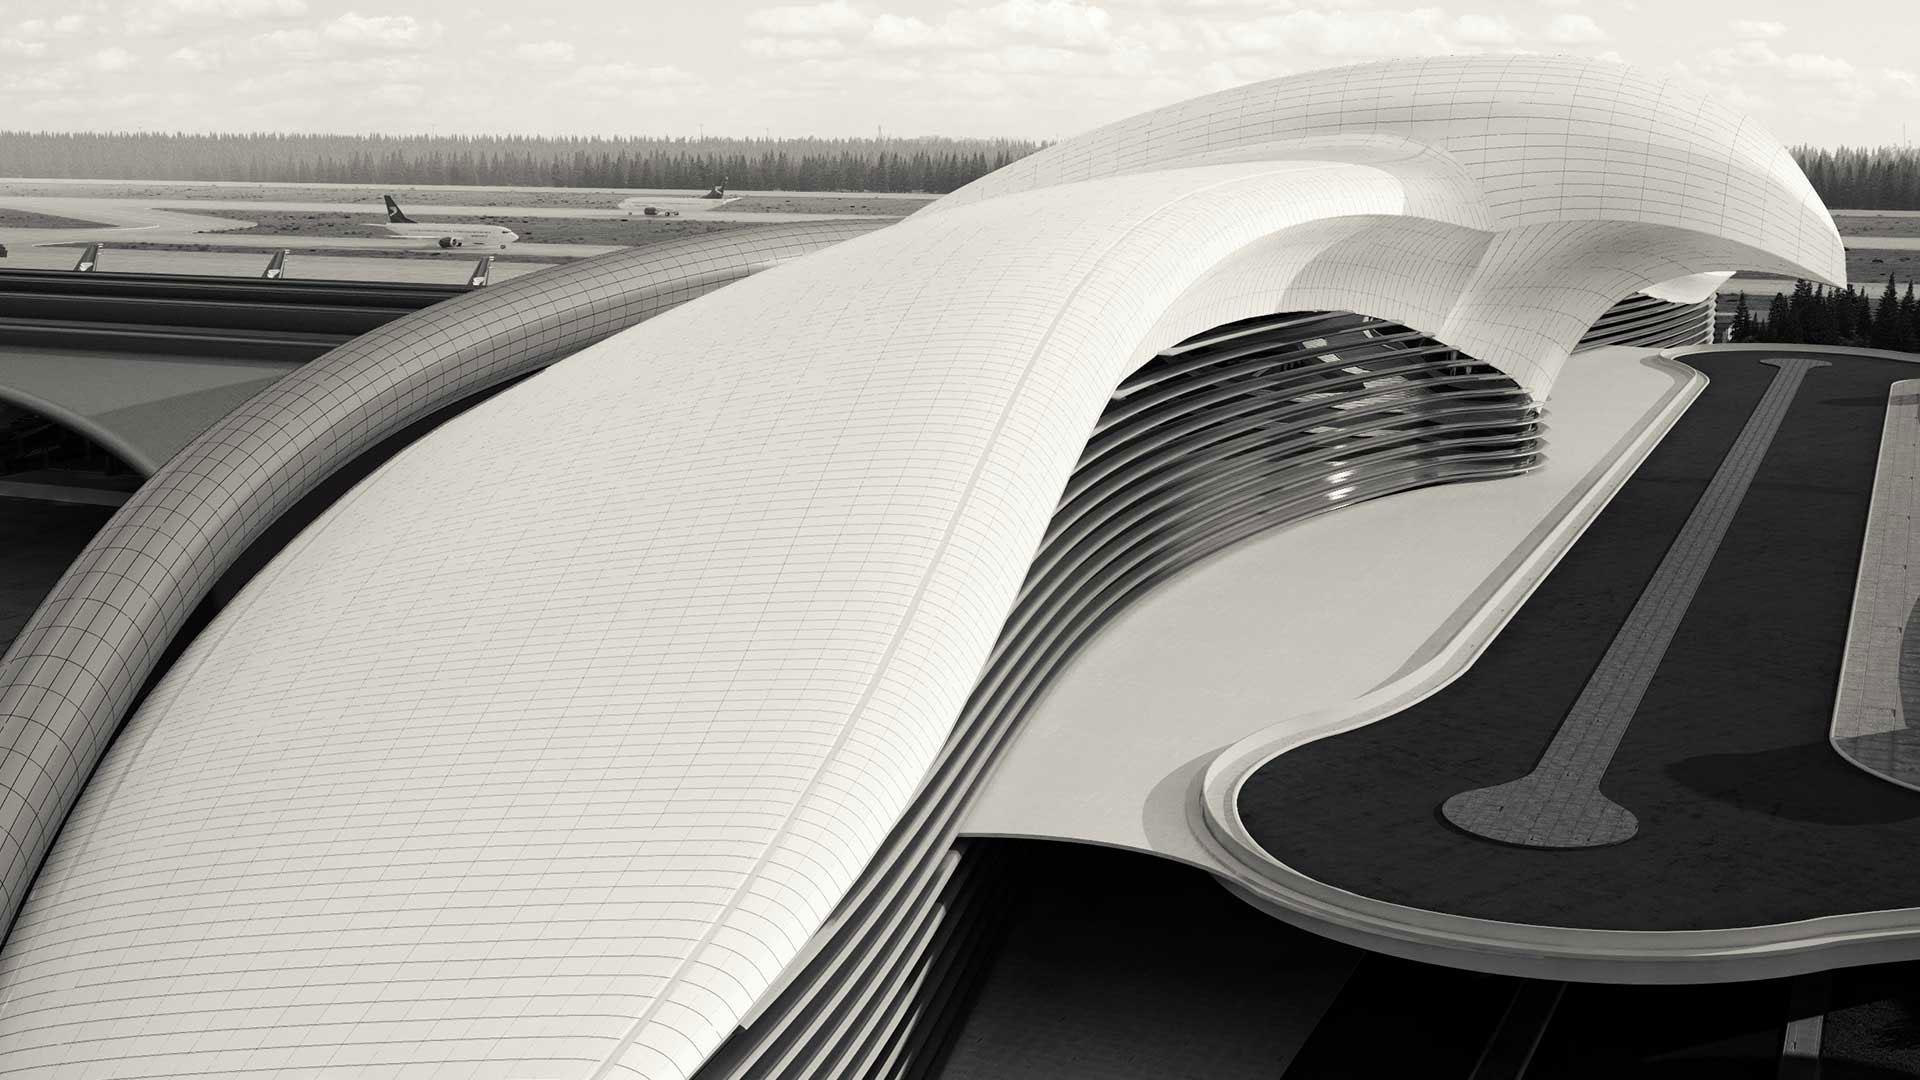 01_airport_ashgabat